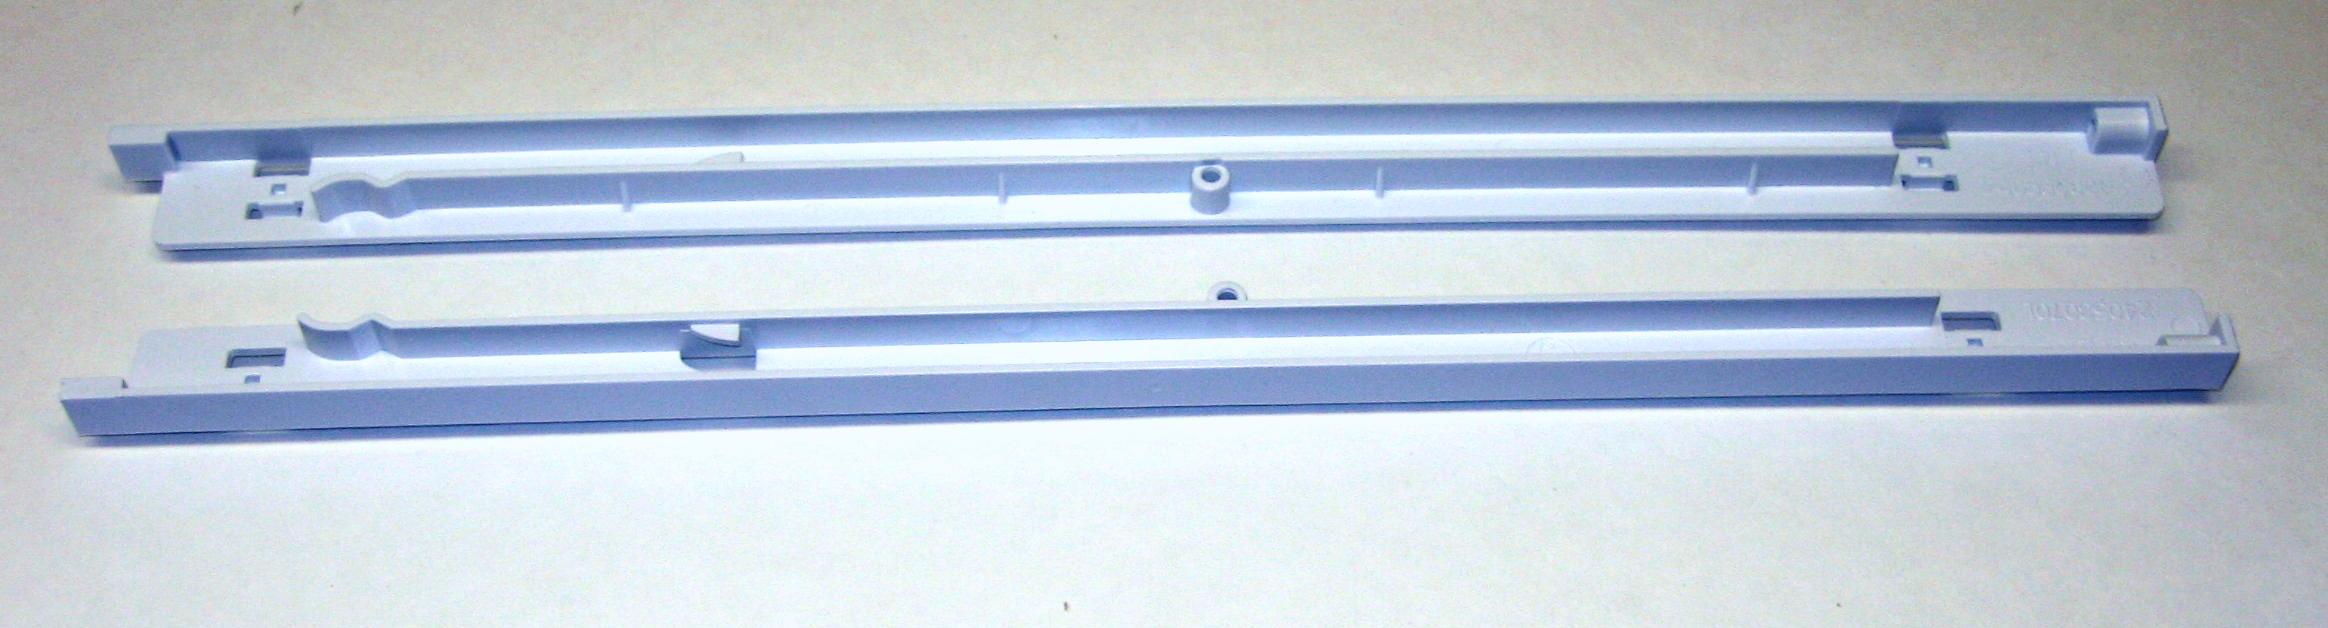 Track Rail  LH /& RH Frigidaire Refrigerator 240530601 240530701 2-Set